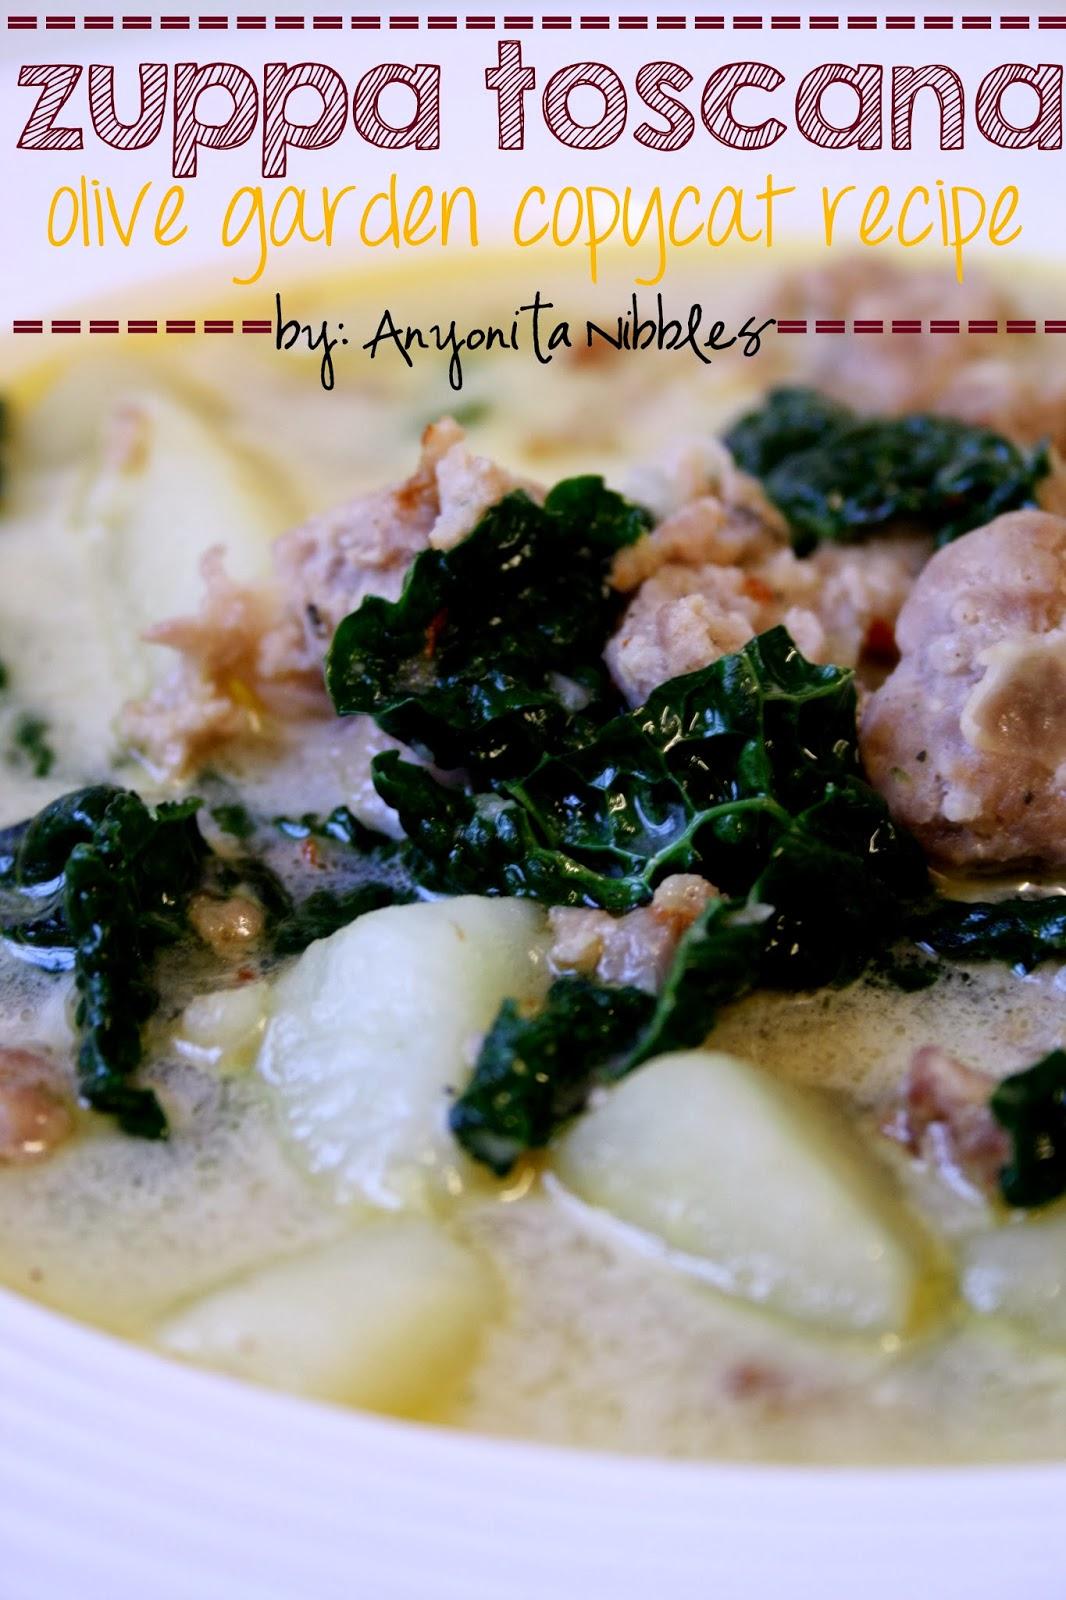 Anyonita Nibbles Gluten Free Recipes Gluten Free Zuppa Toscana Olive Garden Copycat Recipe